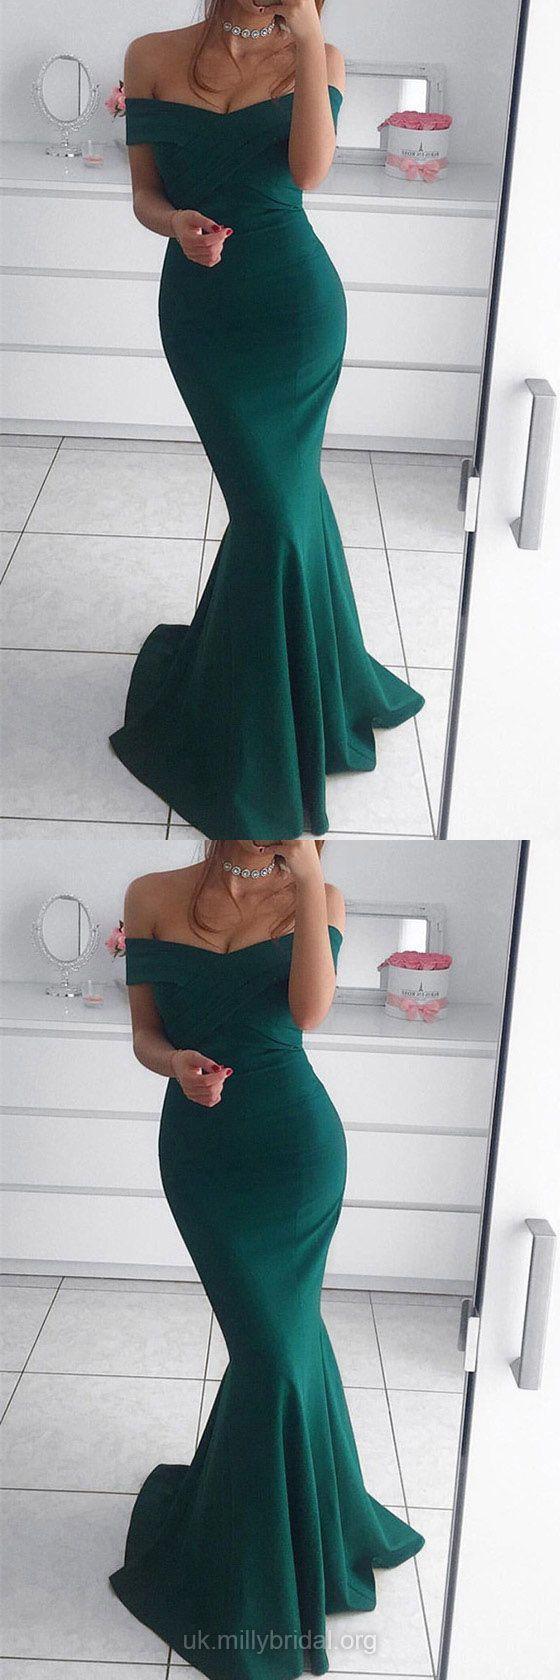 Green prom dresses long prom dresses sexy prom dresses silklike